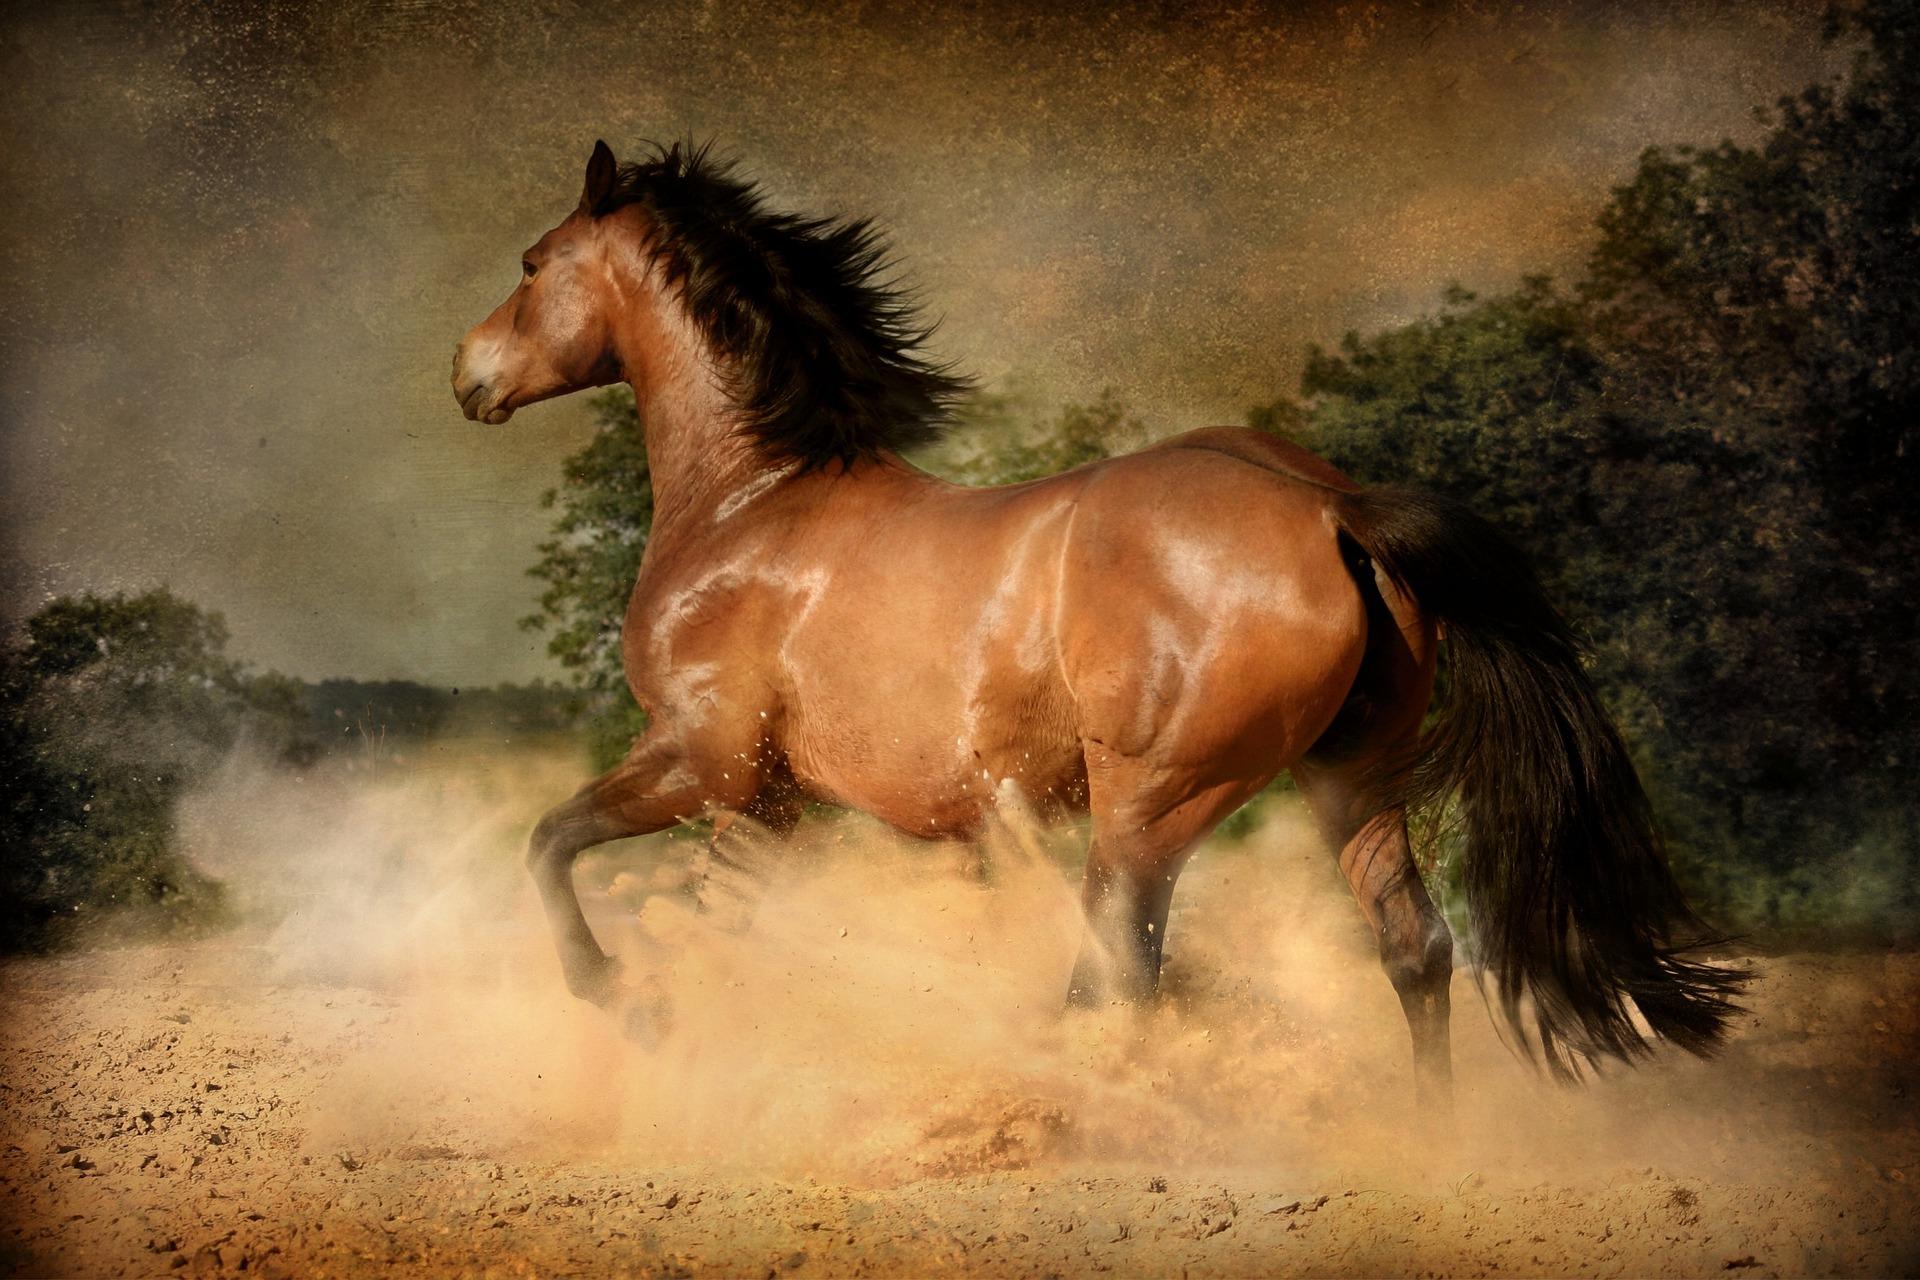 Horse black mane tail Dorota Kudyba Pixabay